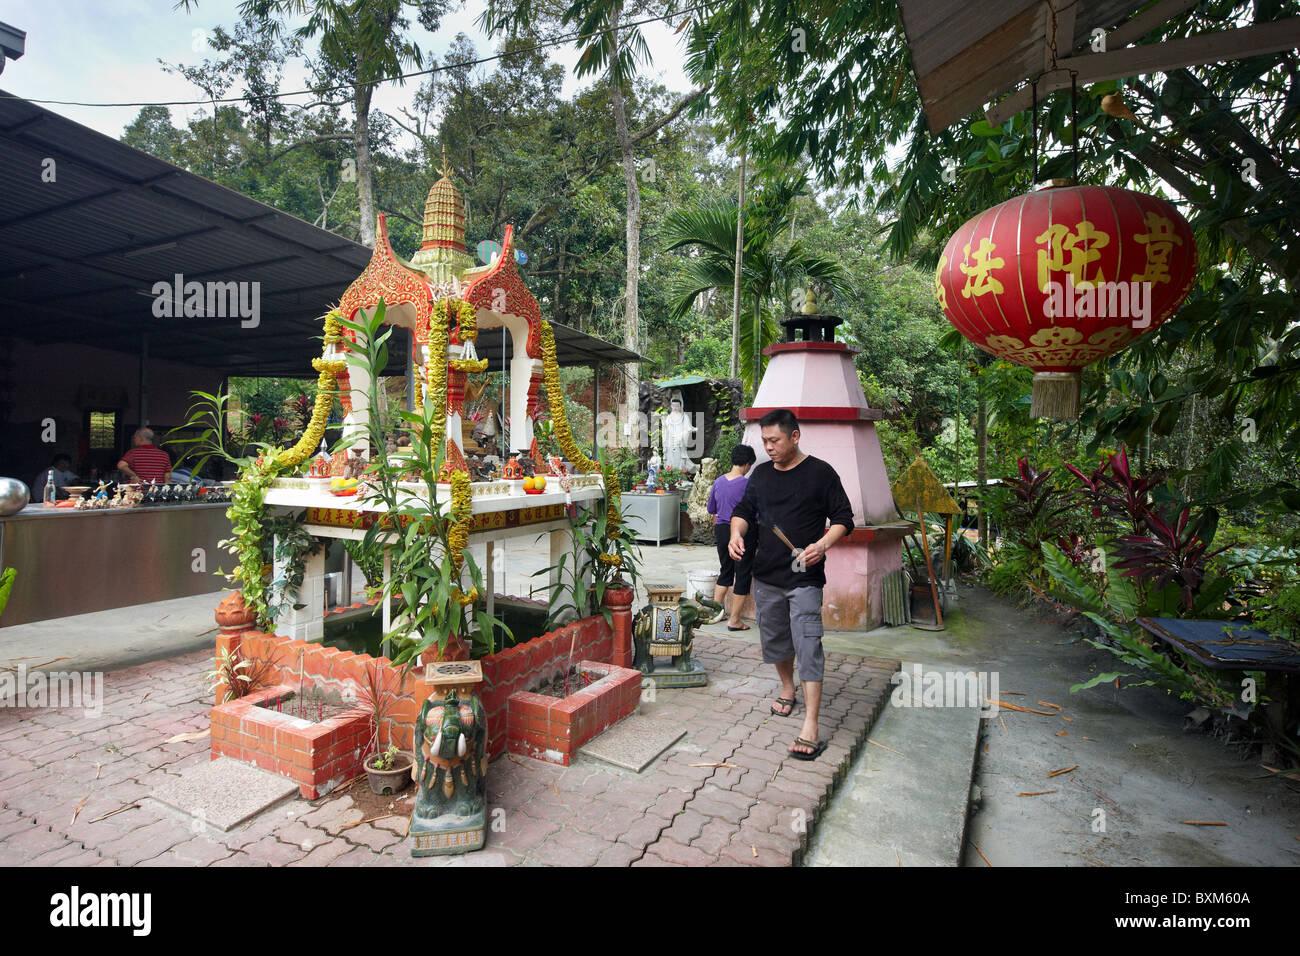 Wei Tou Fa Gong Temple (Lotus Temple), Pulau Ubin, Singapore - Stock Image